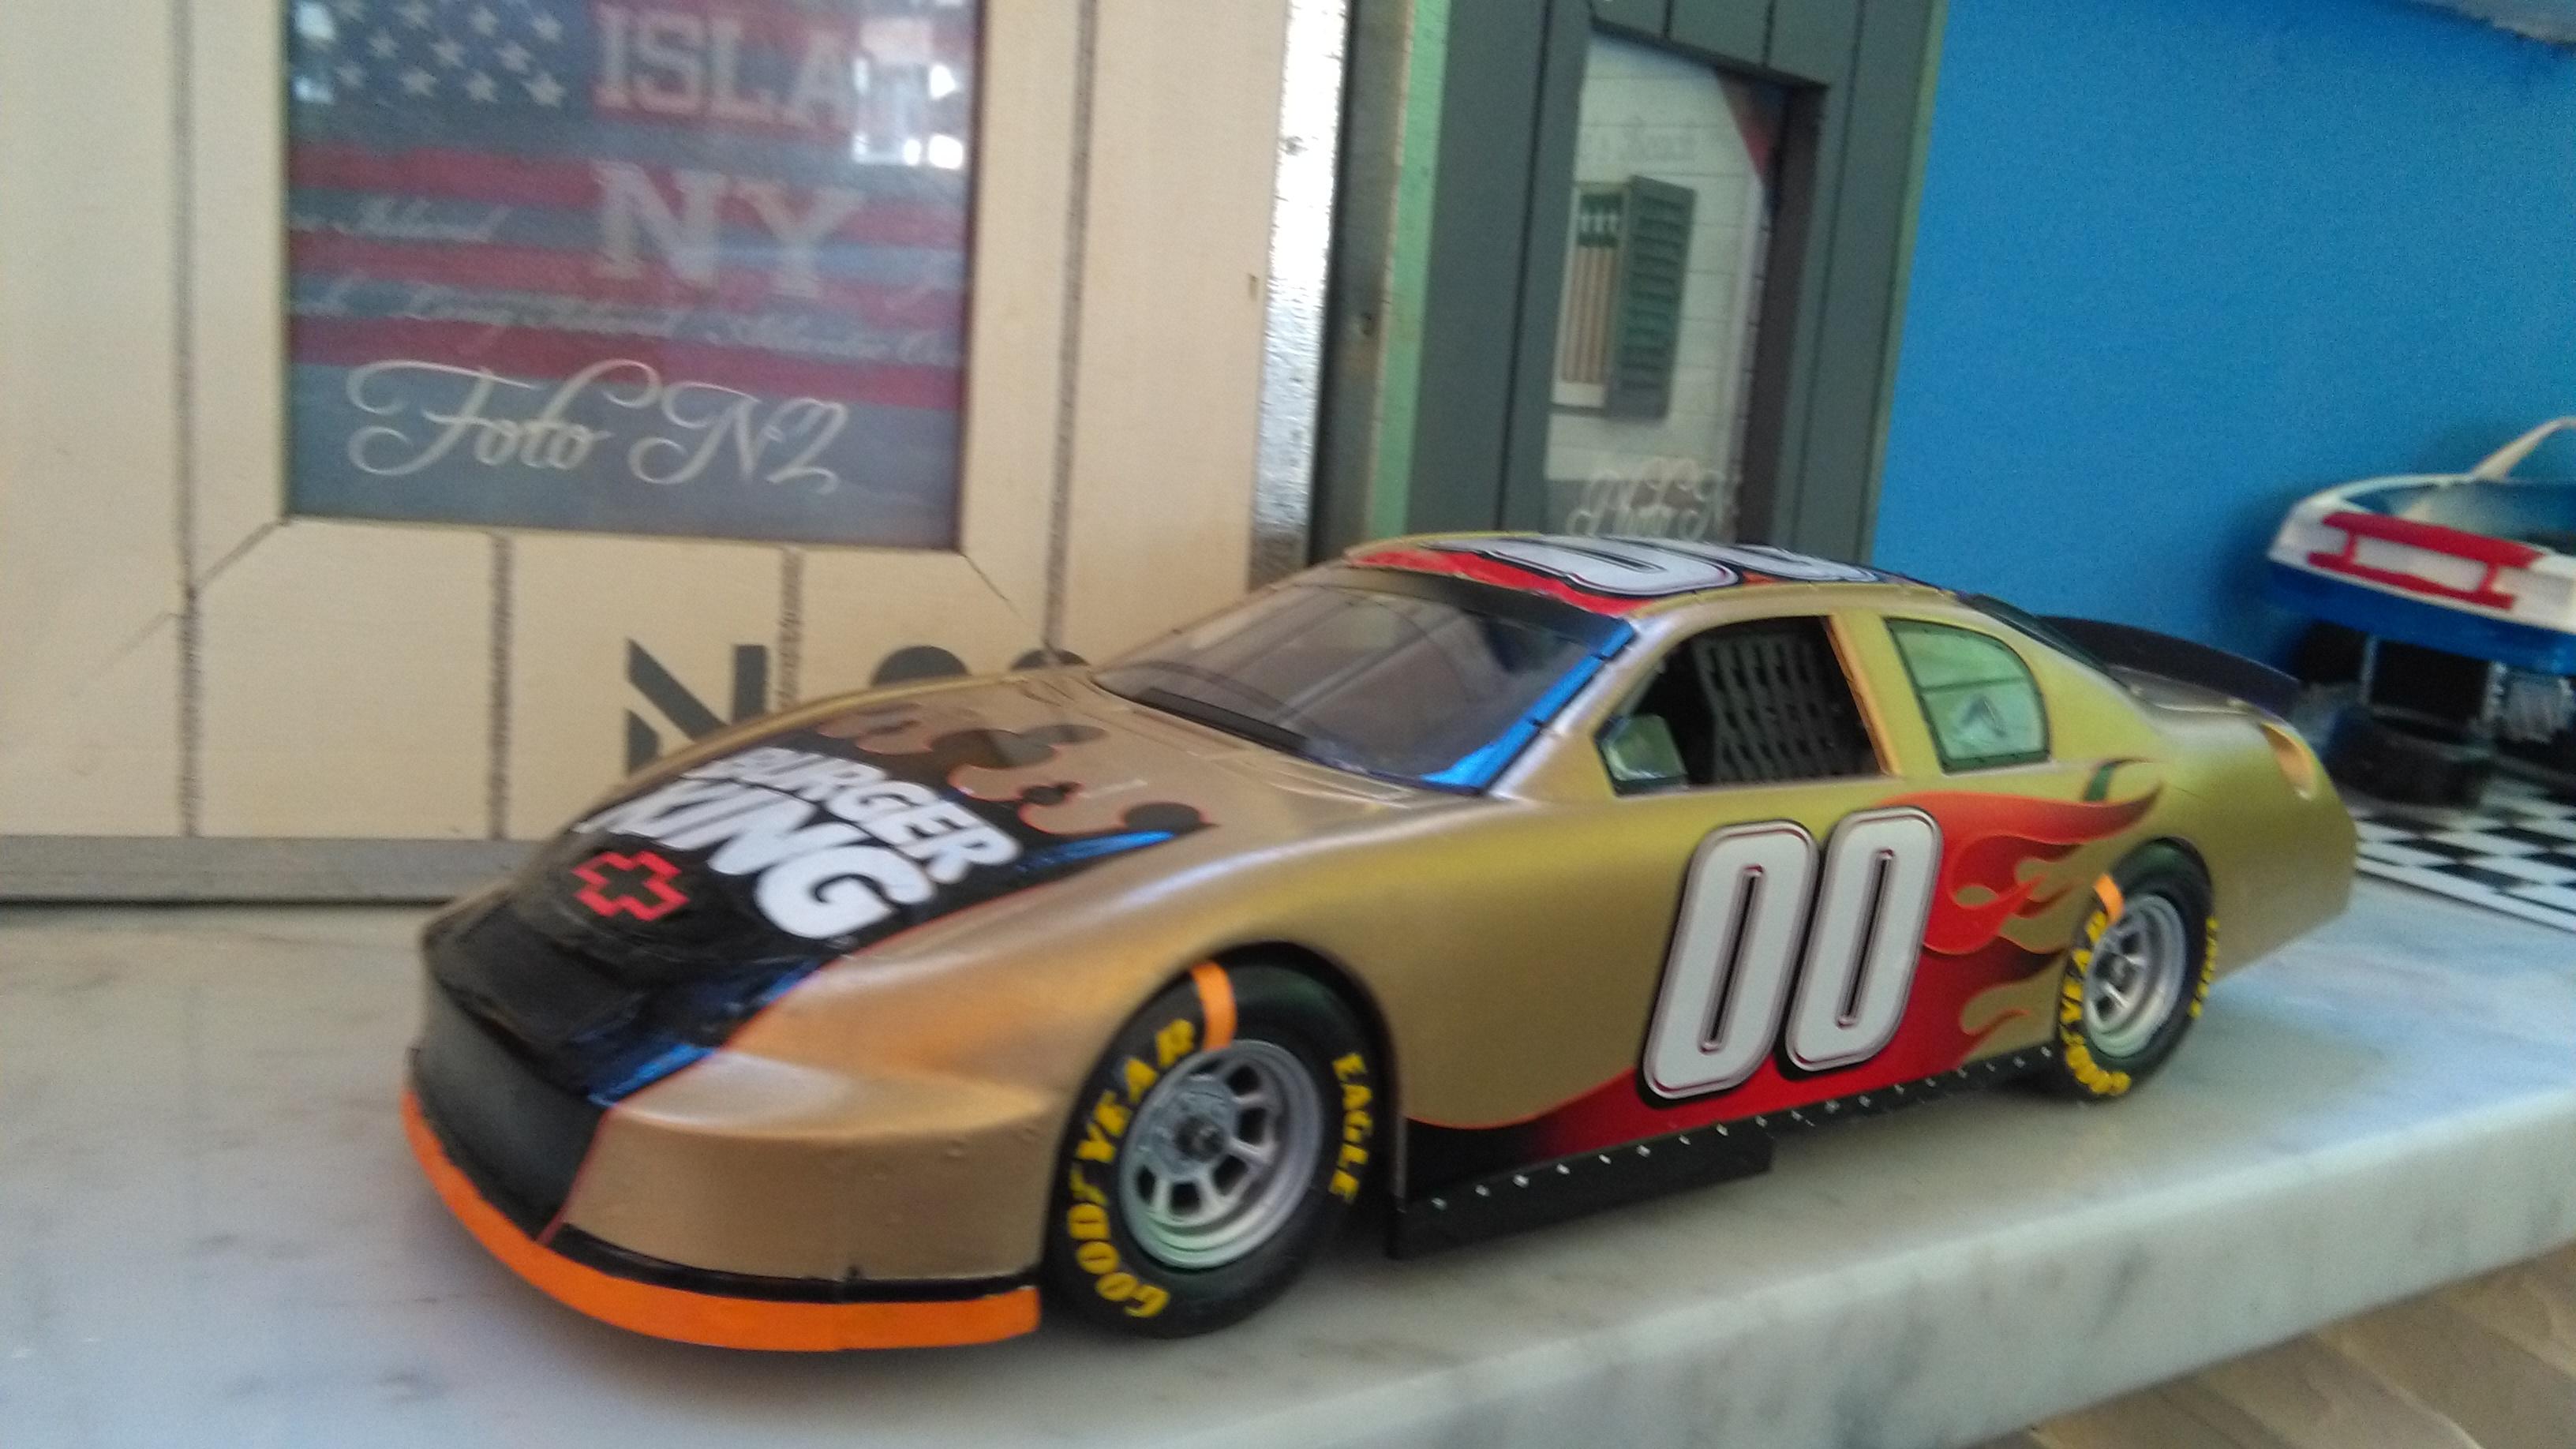 Chevy Monte-Carlo 2006 #00 Bill Elliott Burger King 502142IMG20170510162153